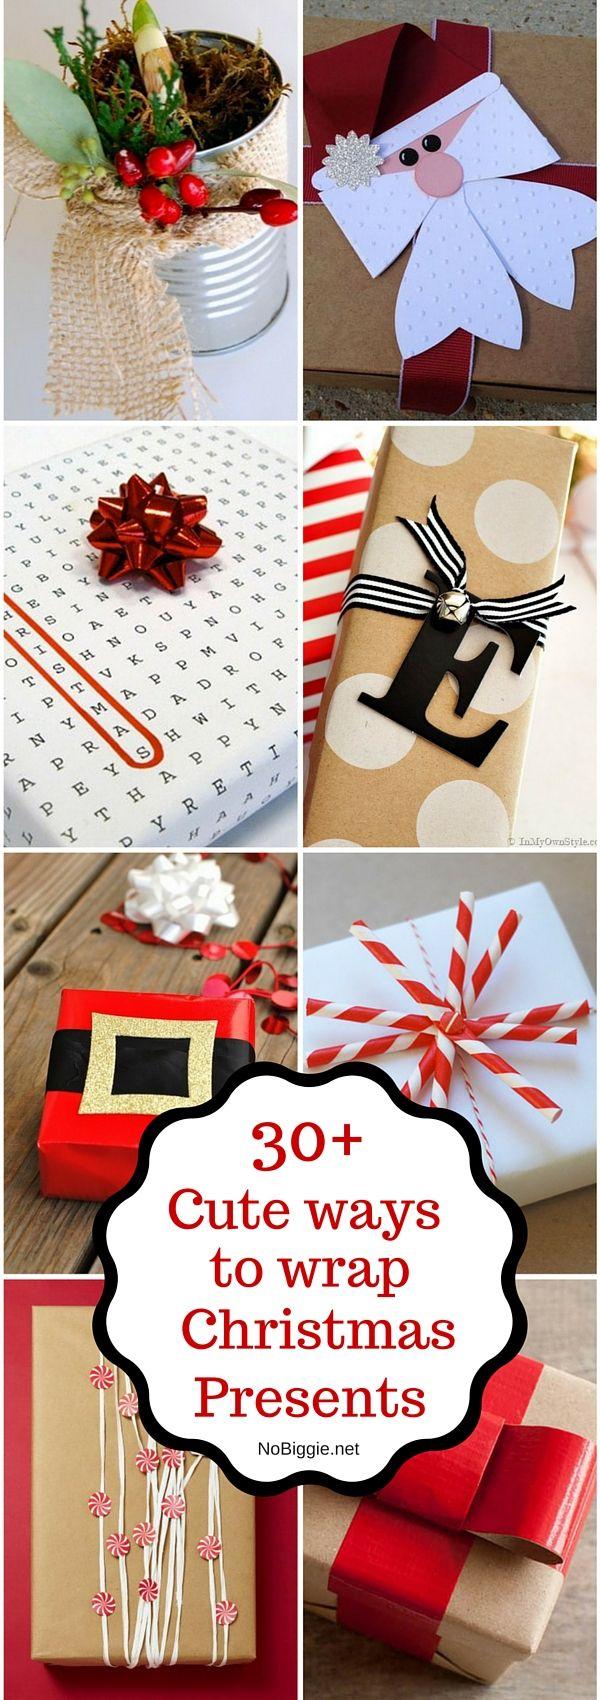 30+ Christmas wrapping ideas | Pinterest Best | Pinterest ...